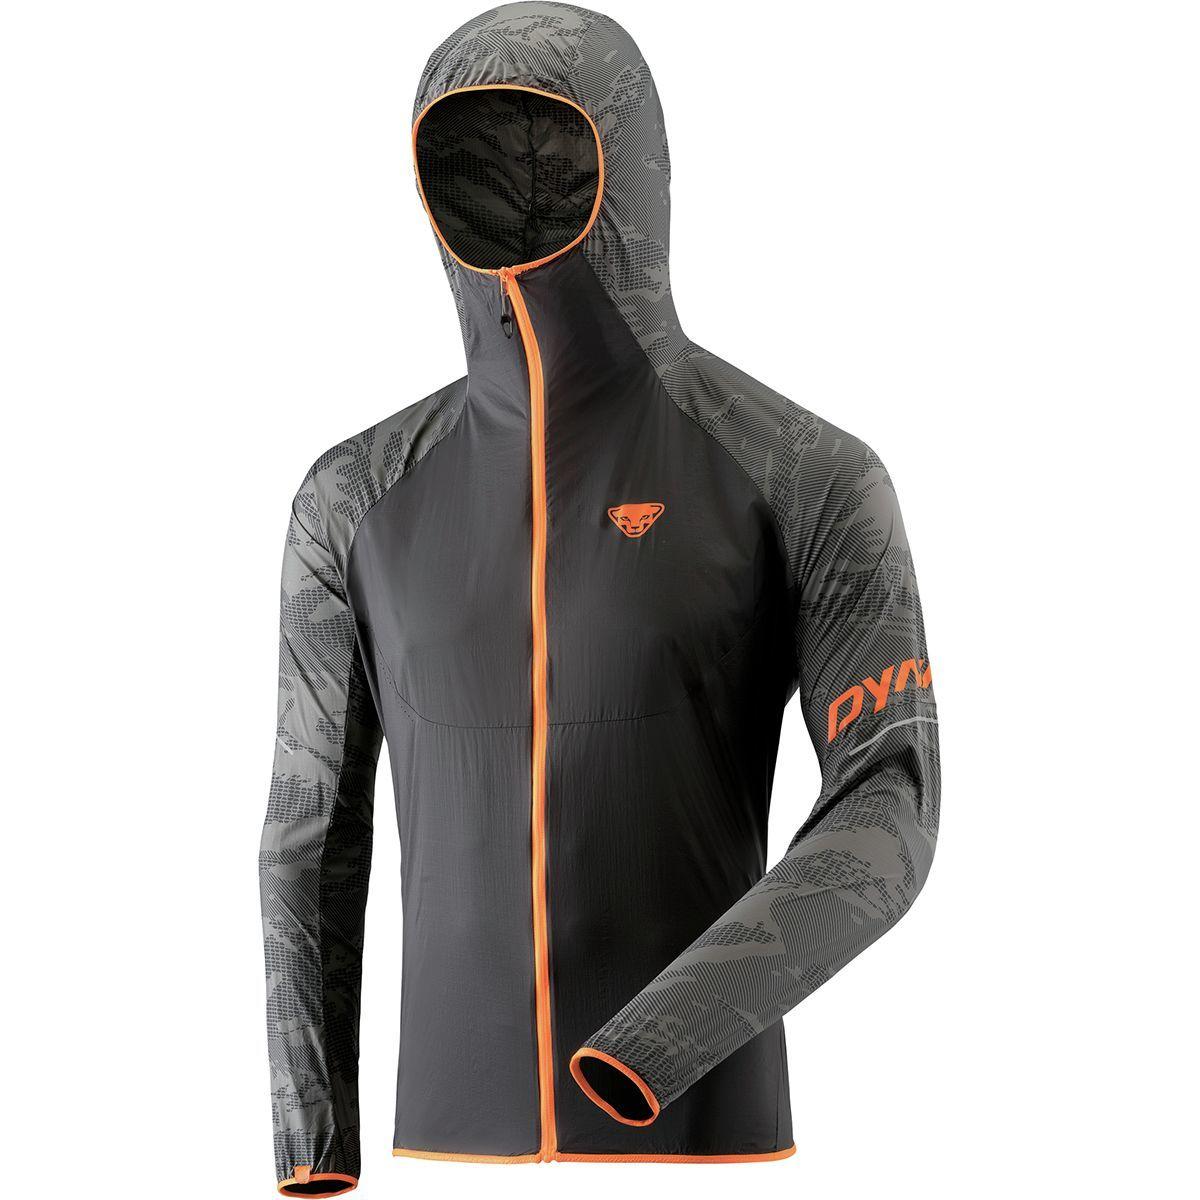 Dynafit Vert Wind 72 Jacket - Men's